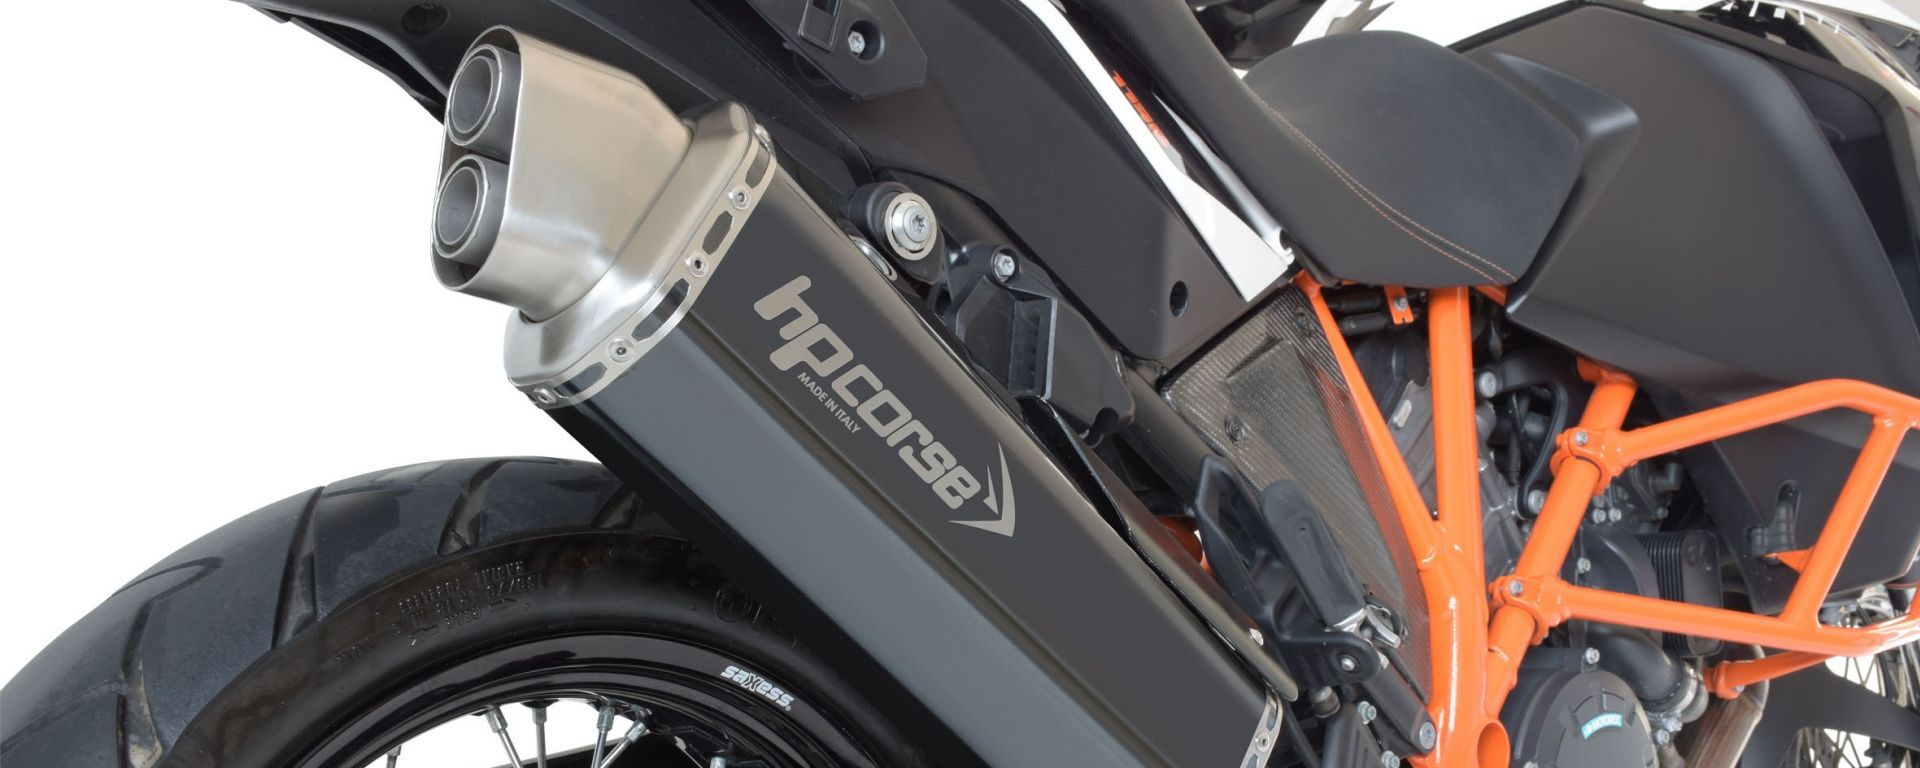 HP Corse 4Track: lo scarico aftermarket per KTM Adventure